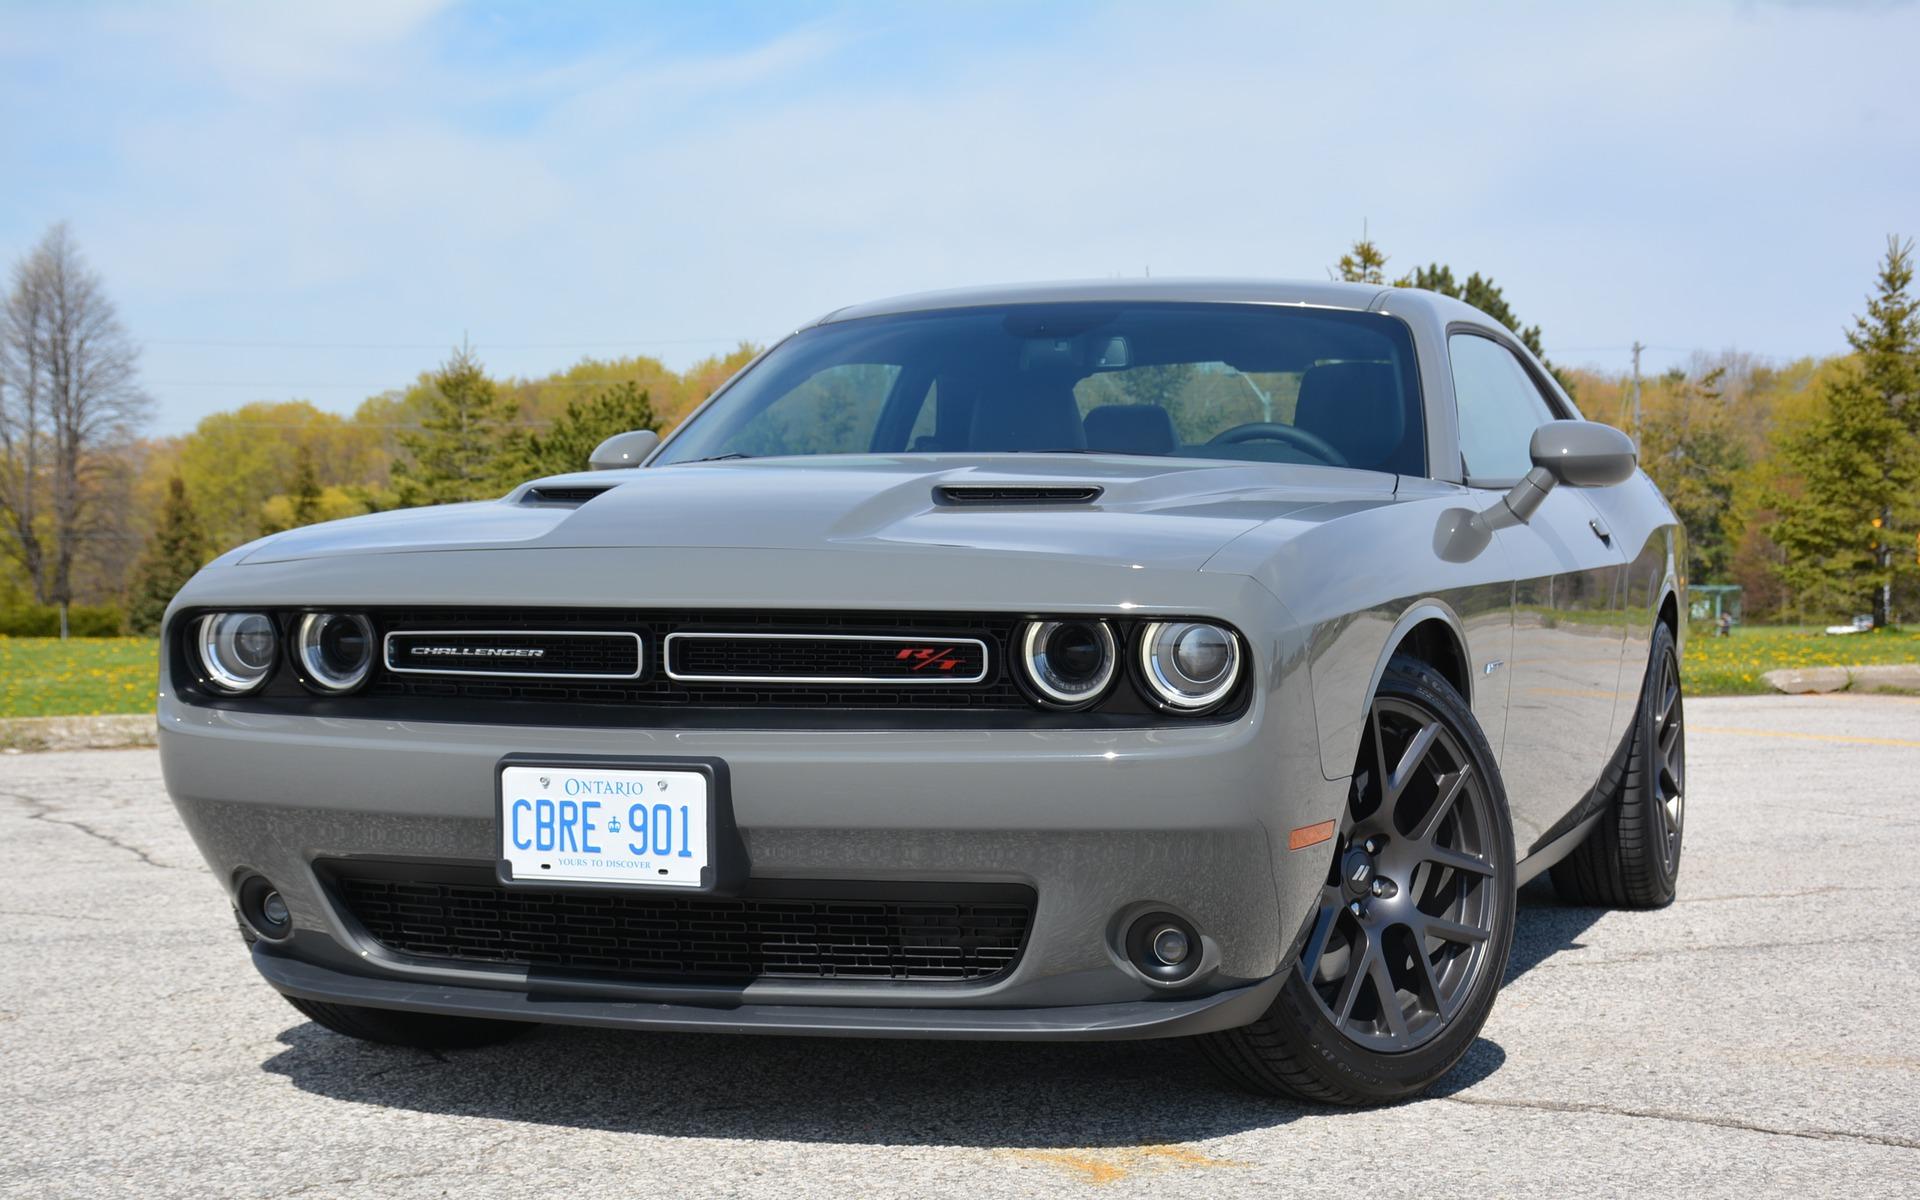 drive challenger styles automotive new autonation t fresh car r of dodge test rt